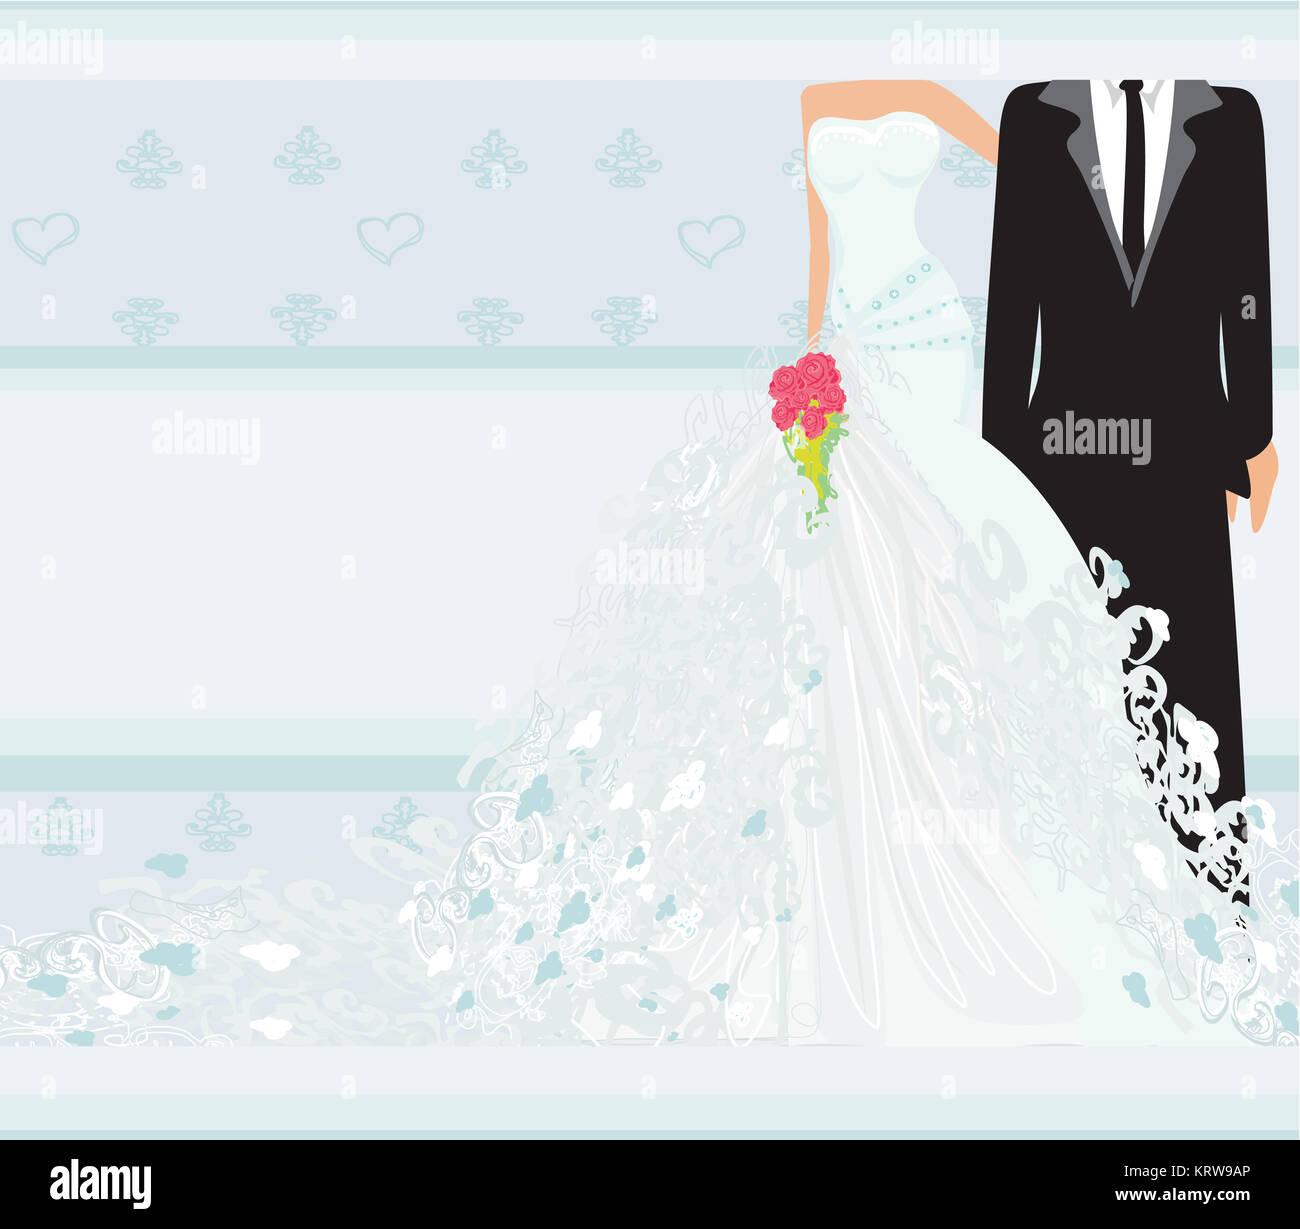 https www alamy com stock image stylish wedding invitation card with vintage ornament background 169586558 html